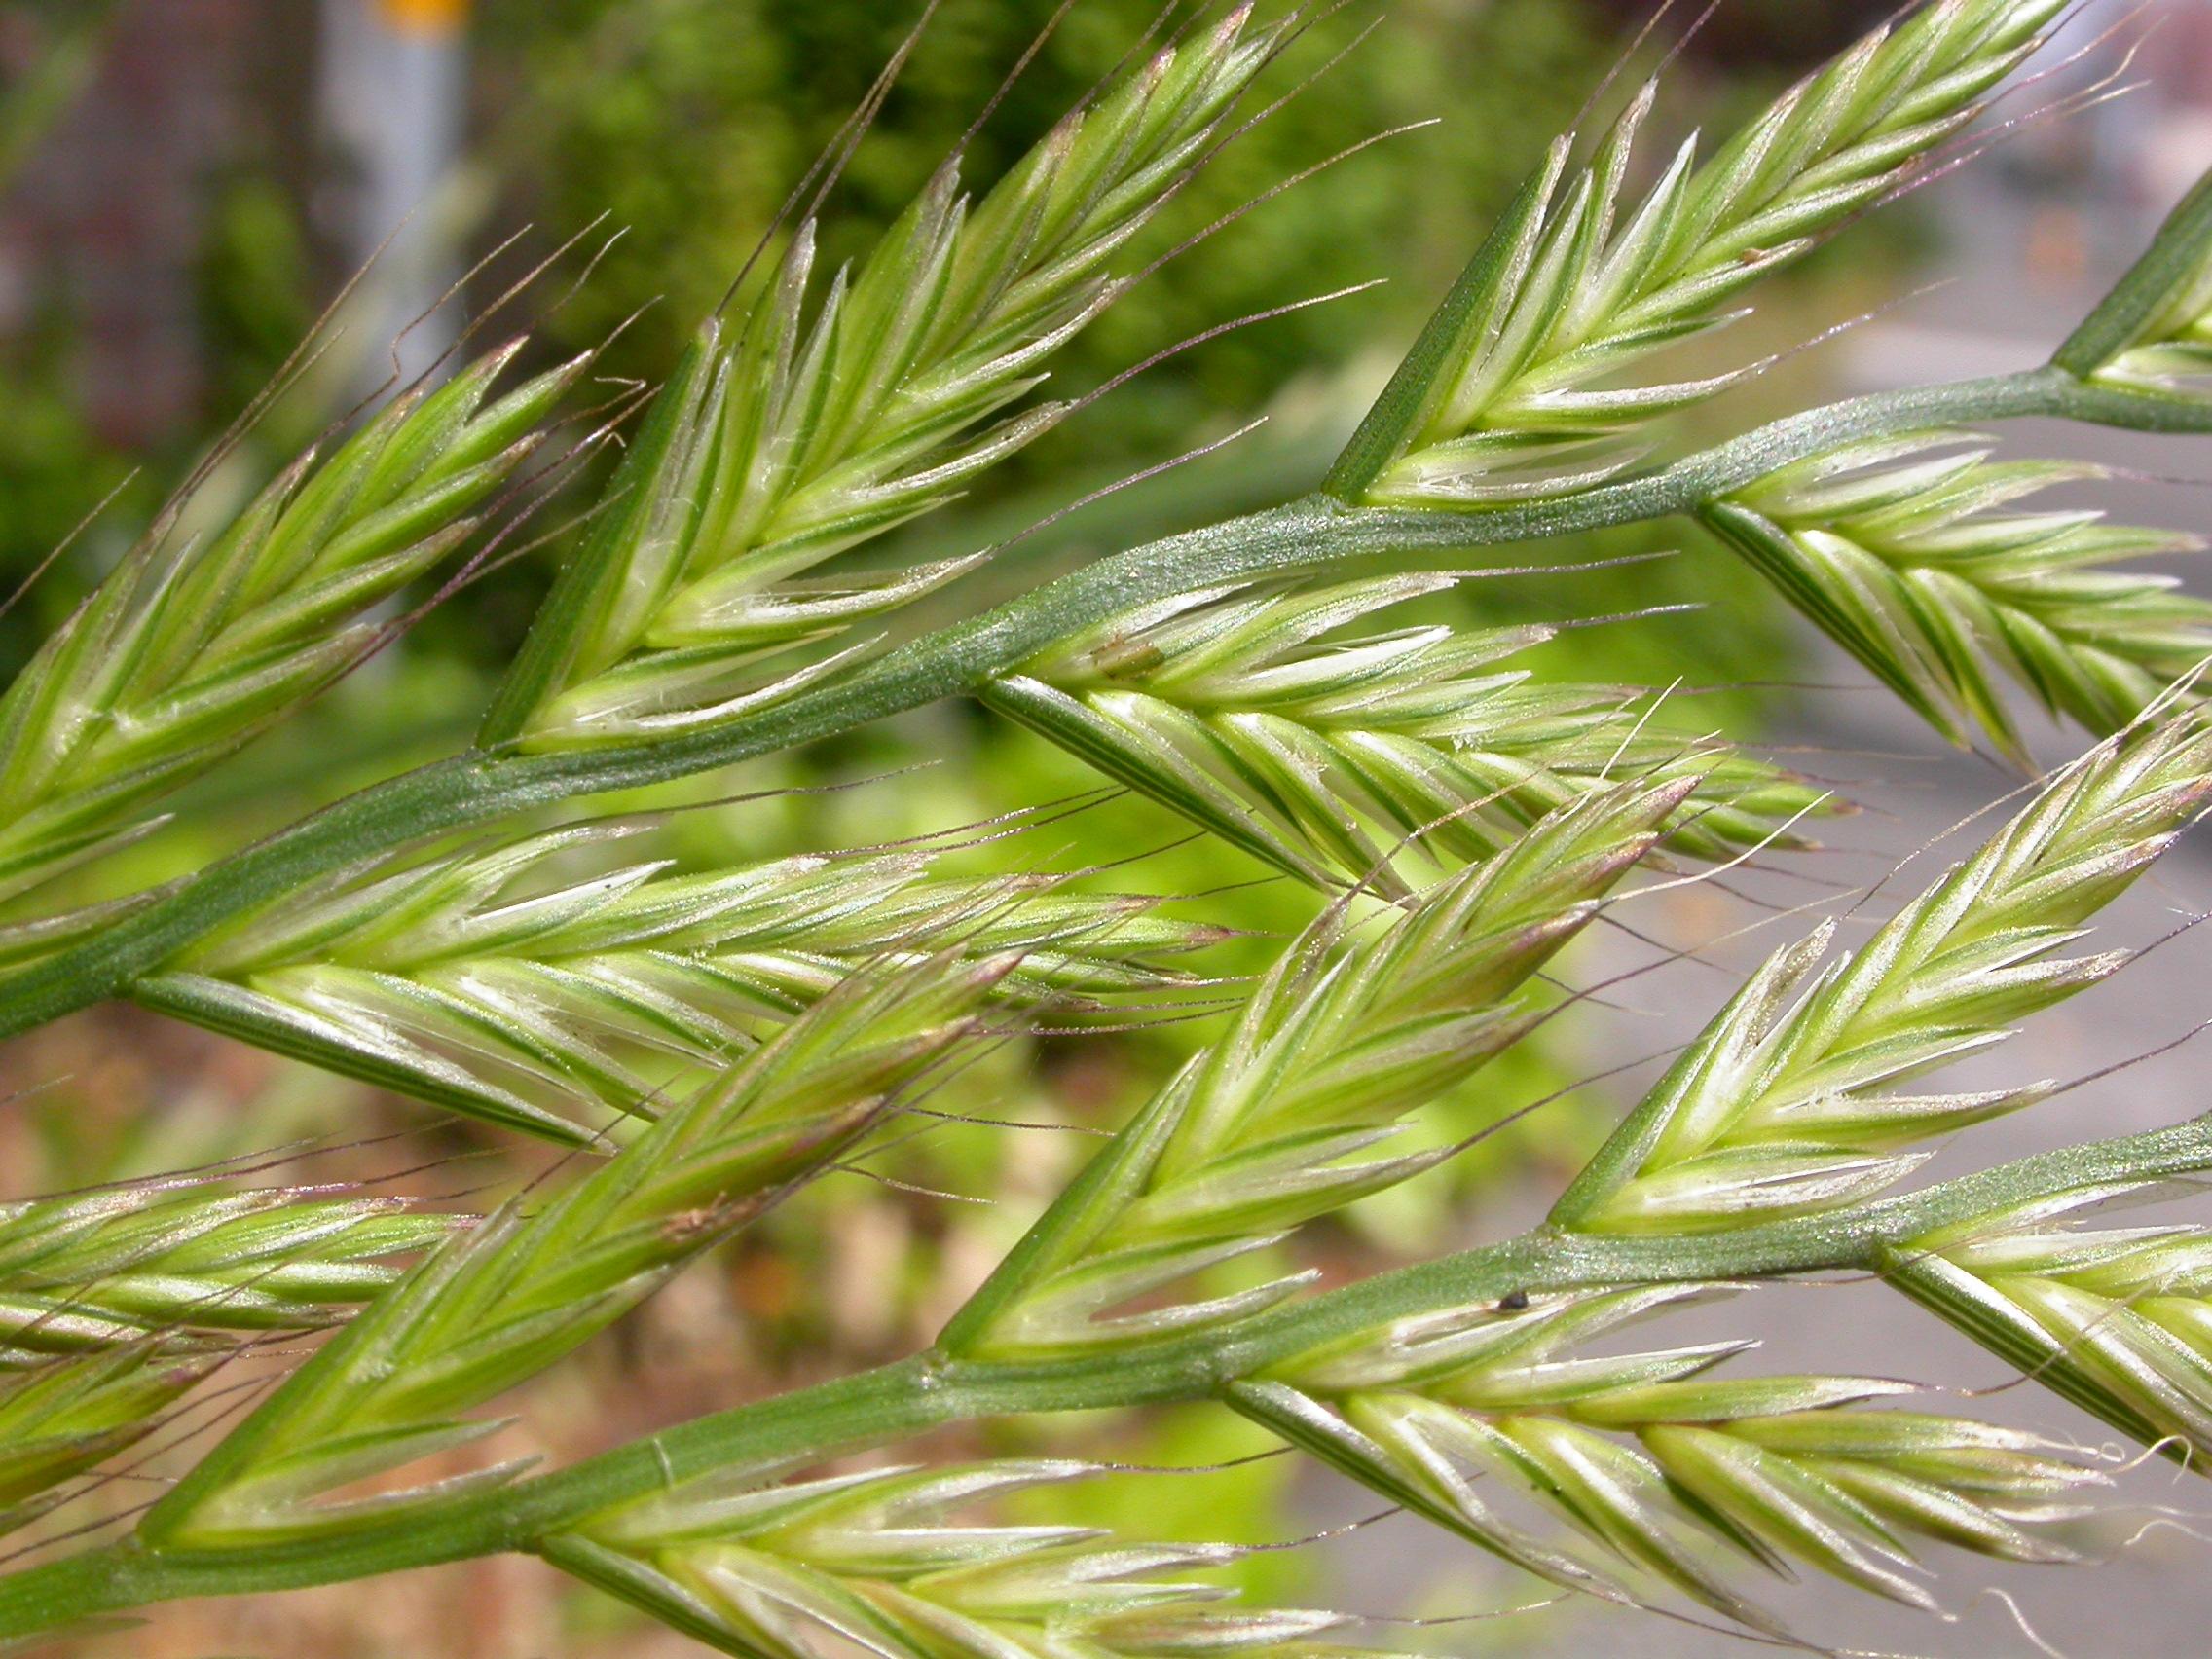 Italian ryegrass ( Lolium multiflorum ) is one of the most studied grasses that host endophytic fungi.